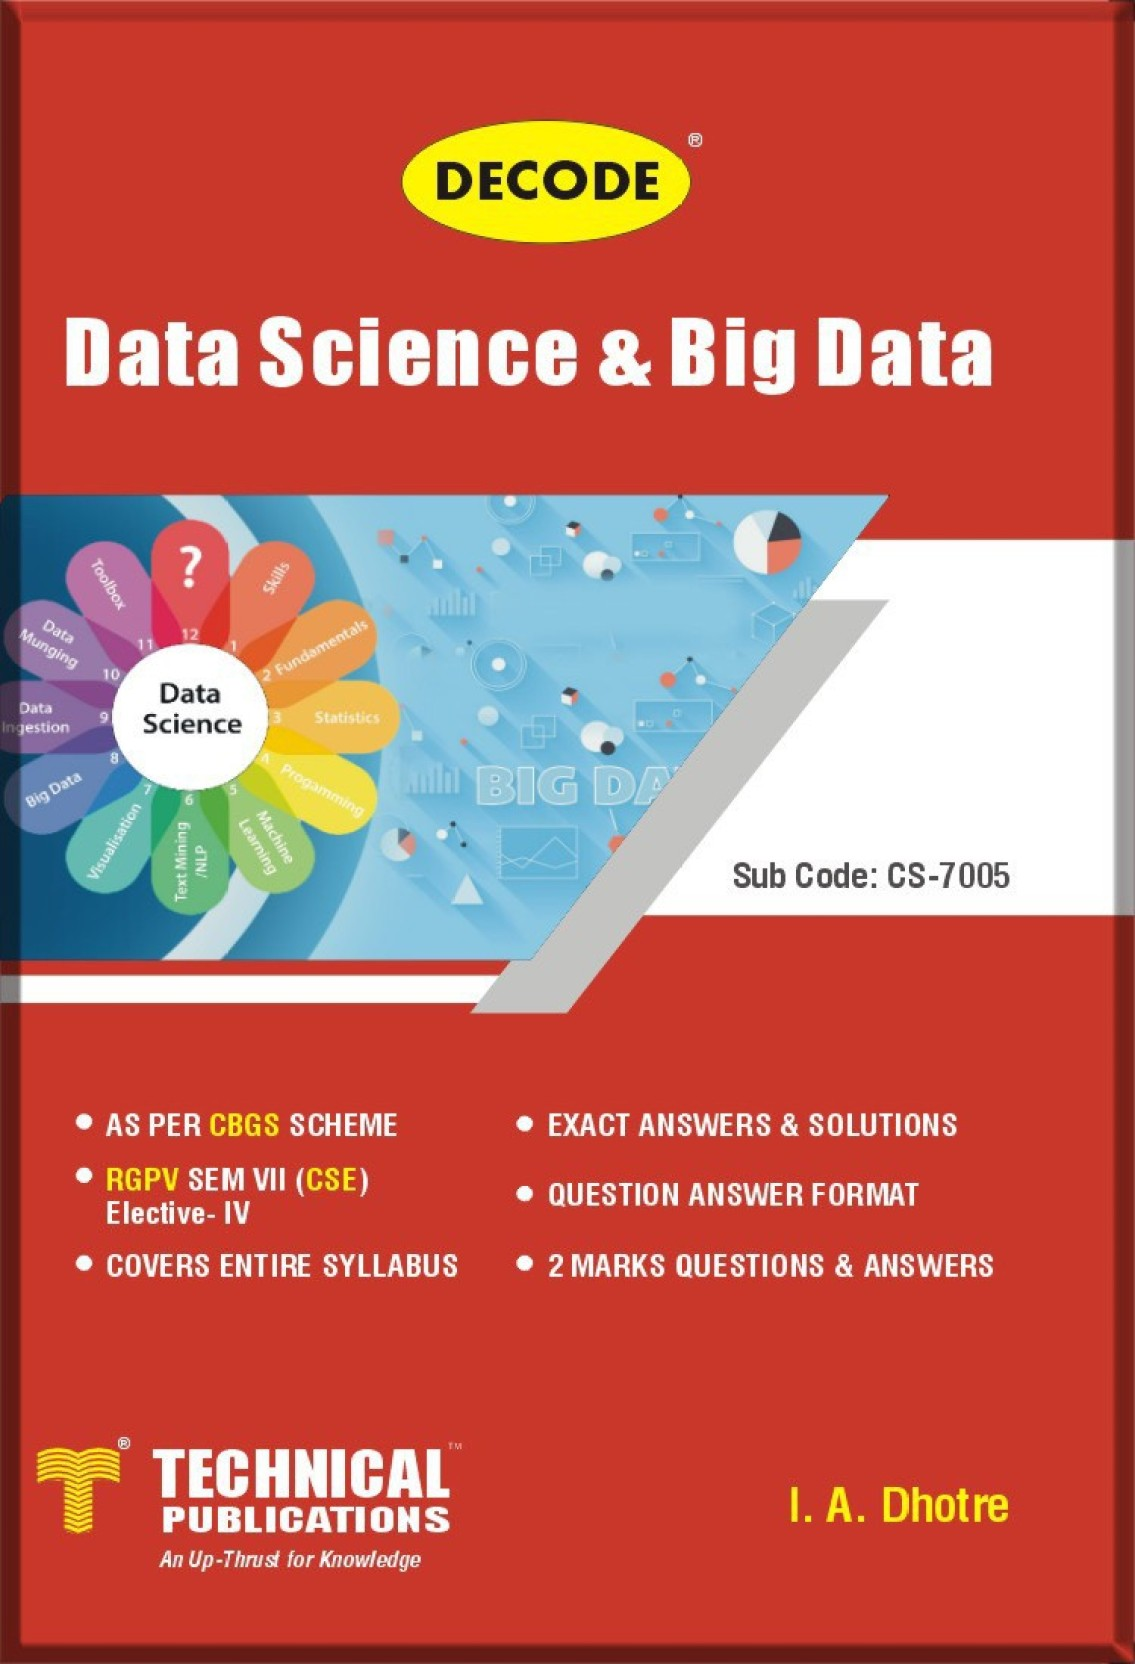 DECODE- DAta Science & Big Data for RGPV (SEM-VII CSE